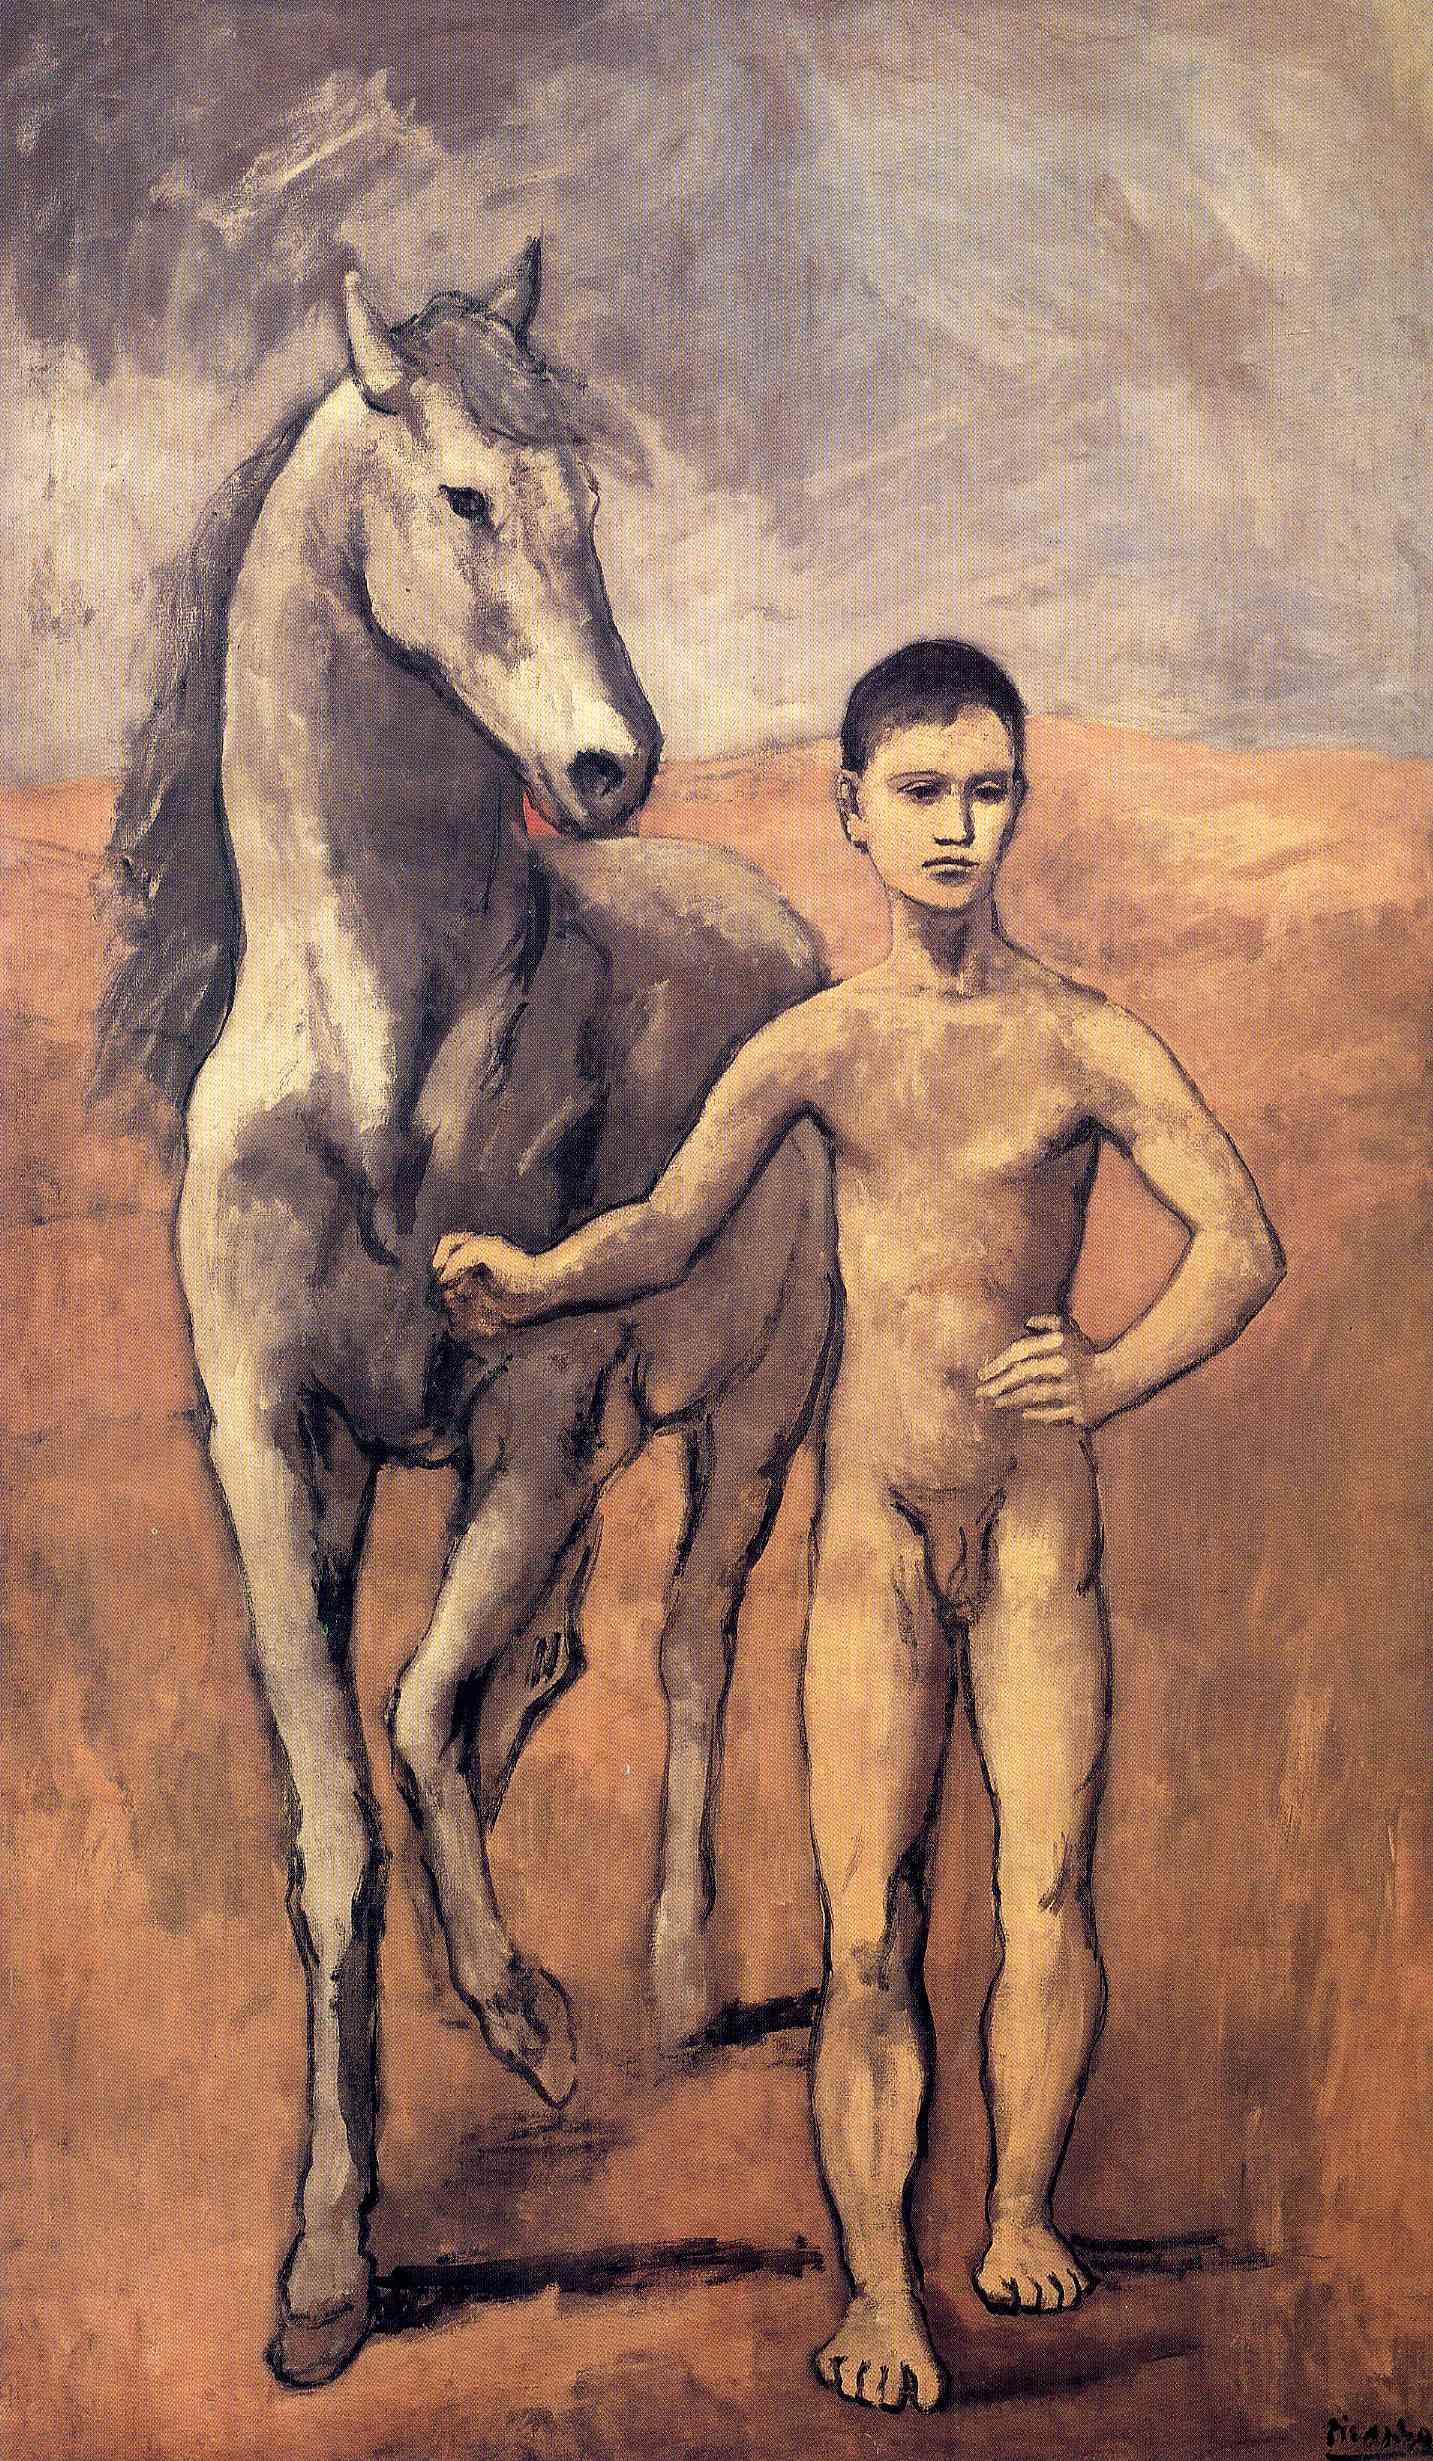 [ Jeune homme et cheval (Boy Leading A Horse) by Pablo Picasso, 1906.]